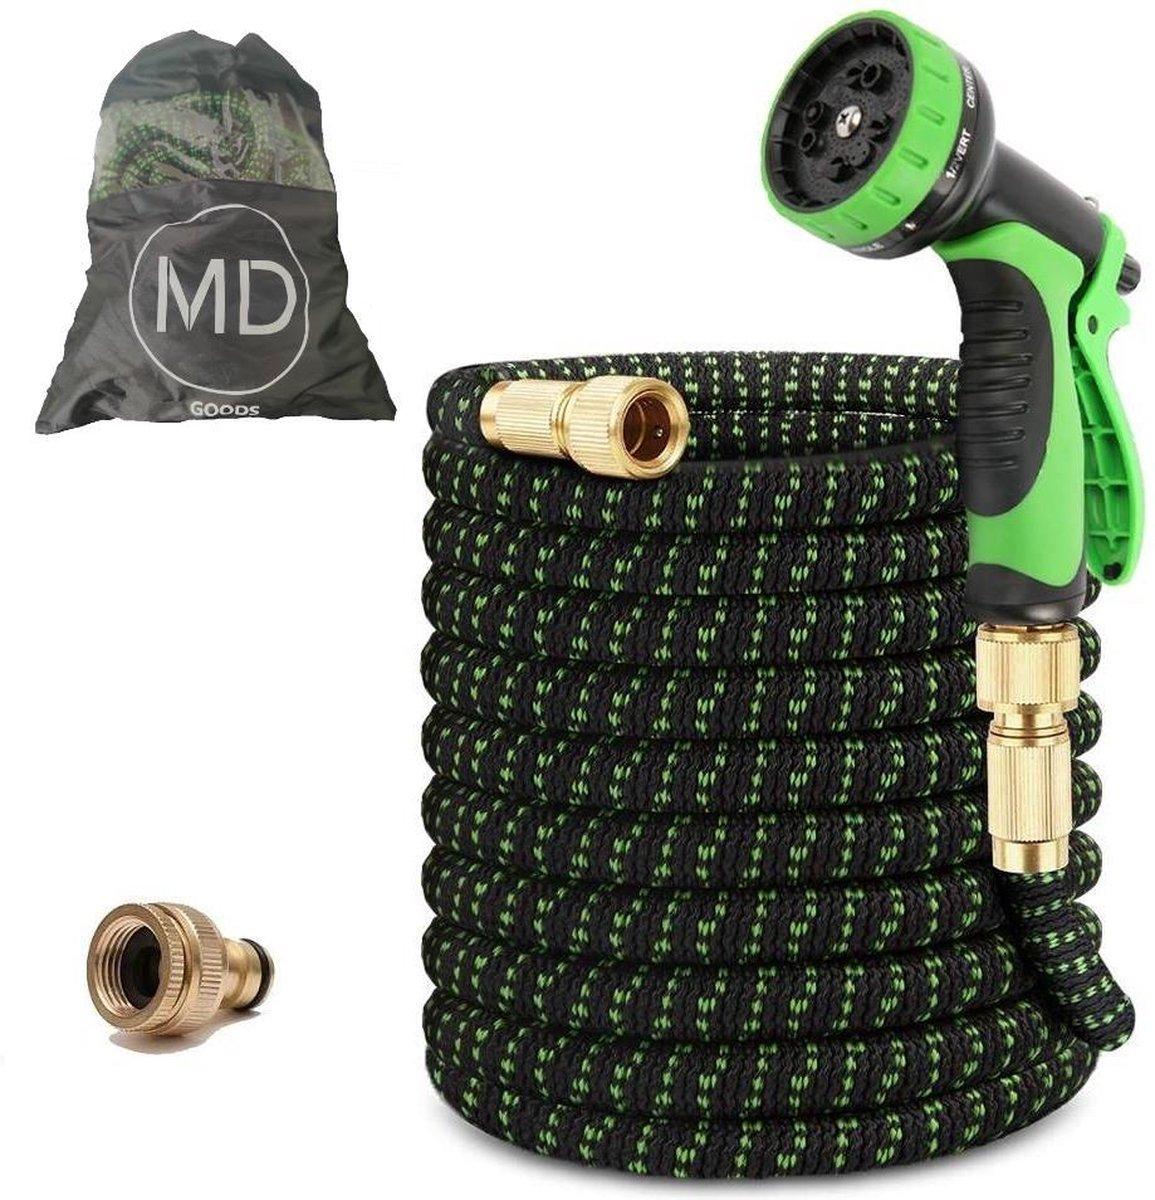 MD-Goods ® Super Sterk Uitrekbare Tuinslang tot 30 Meter + GRATIS tas en koppelstuk - Tuinsproeier -